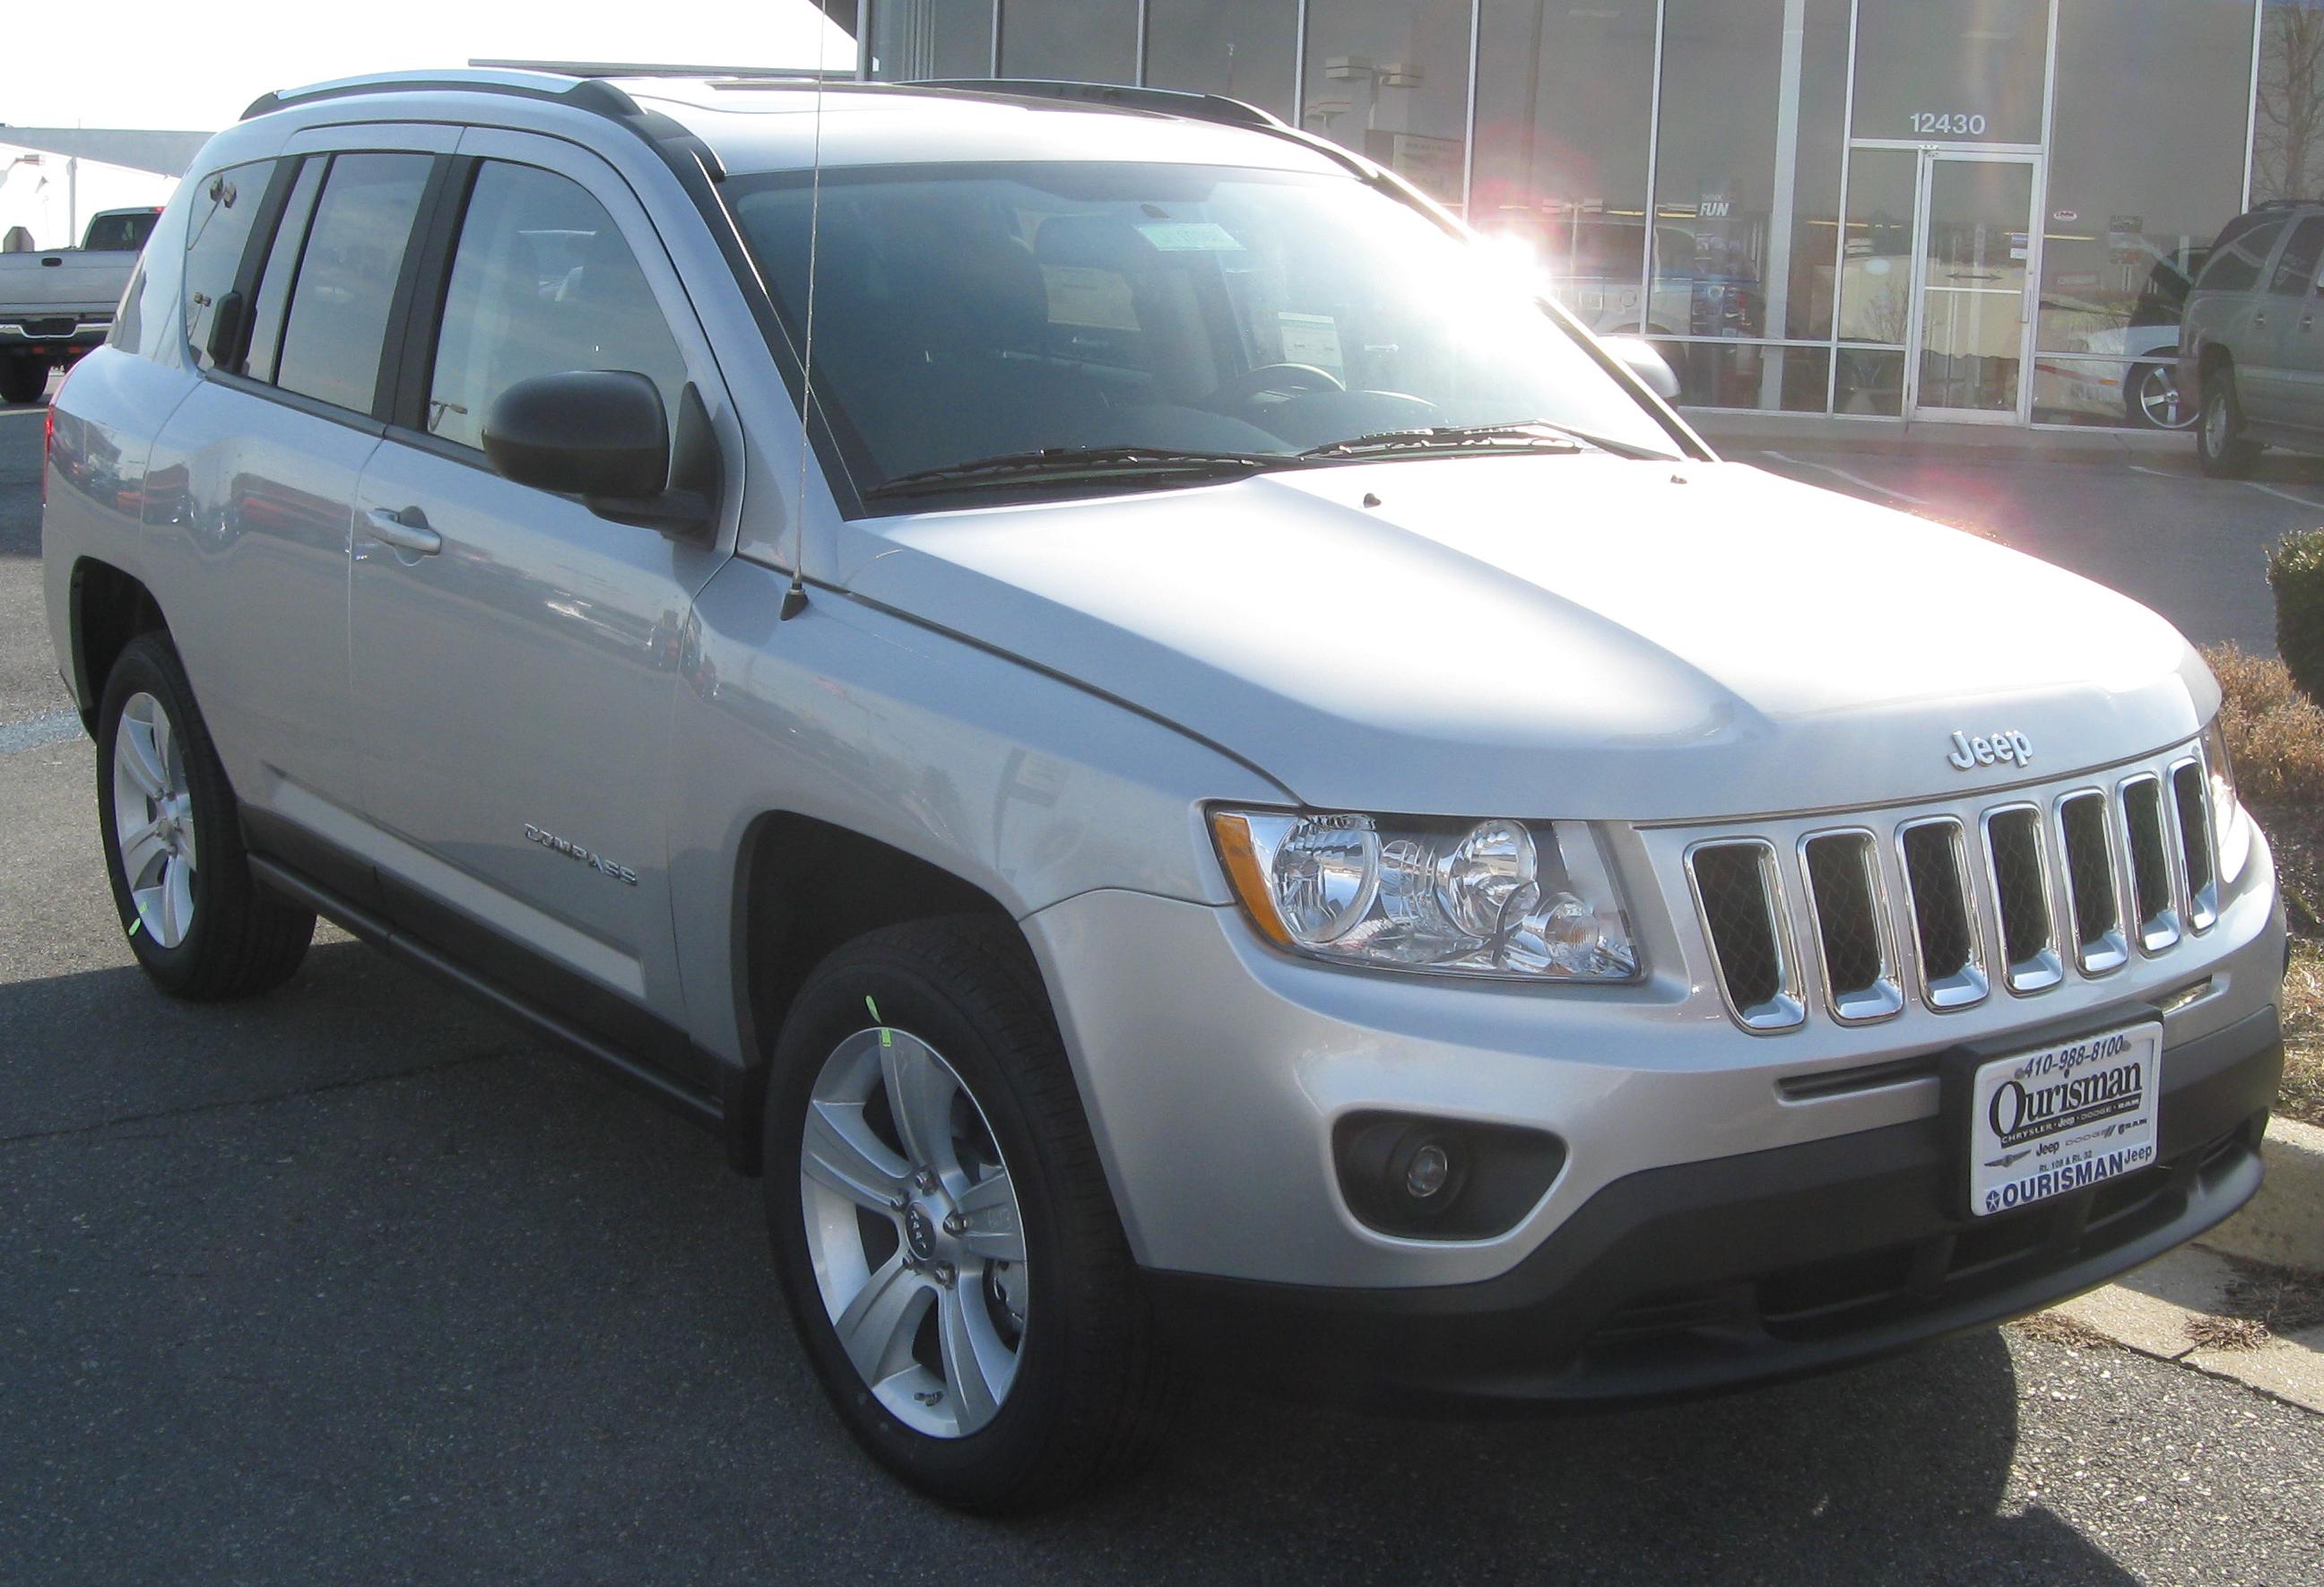 File:2011 Jeep Compass -- 02-17-2011.jpg